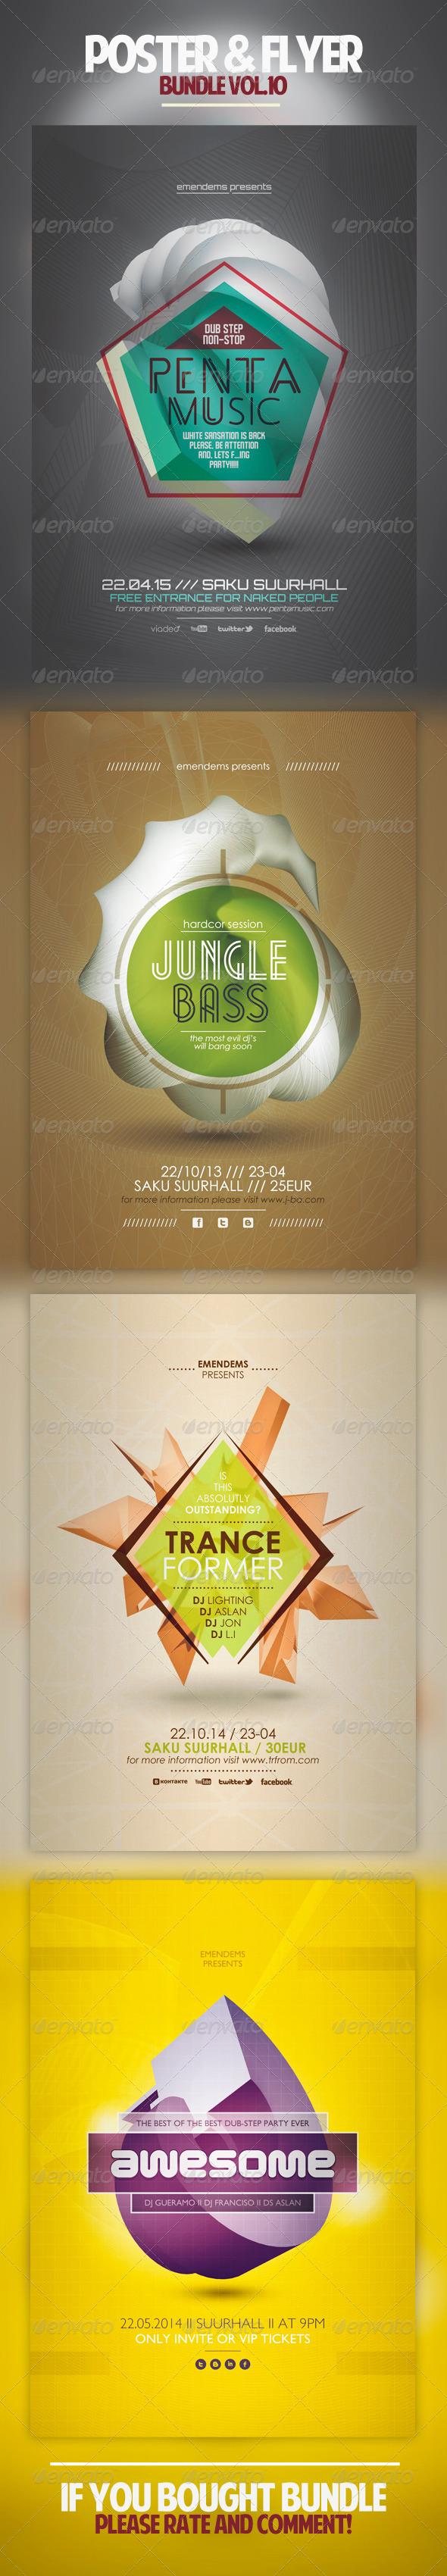 GraphicRiver Poster & Flyer Bundle Vol.10 5027202